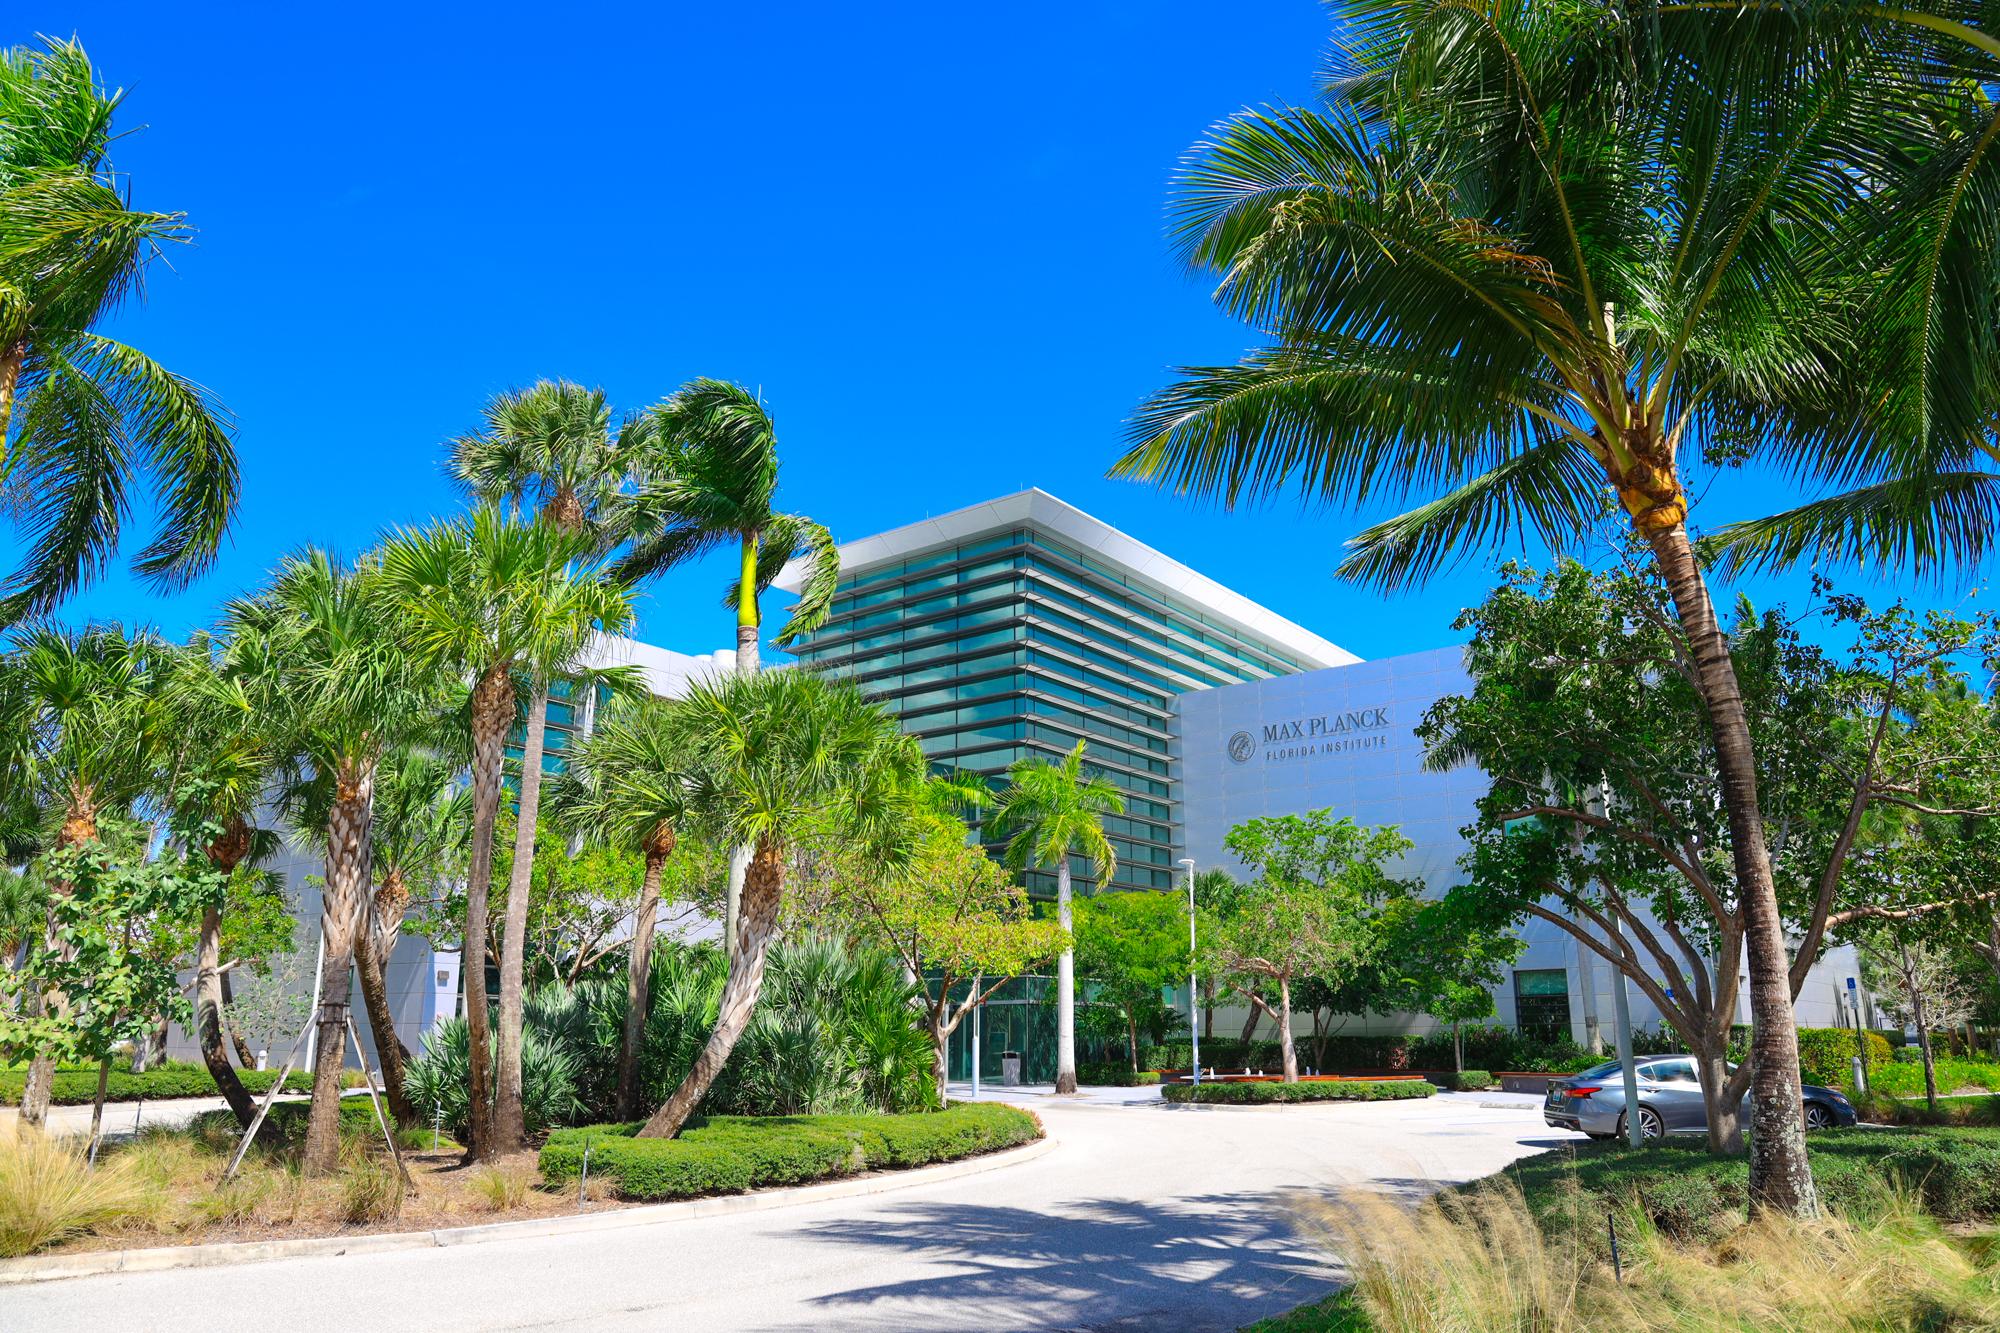 Max Planck Florida Institute for Neuroscience